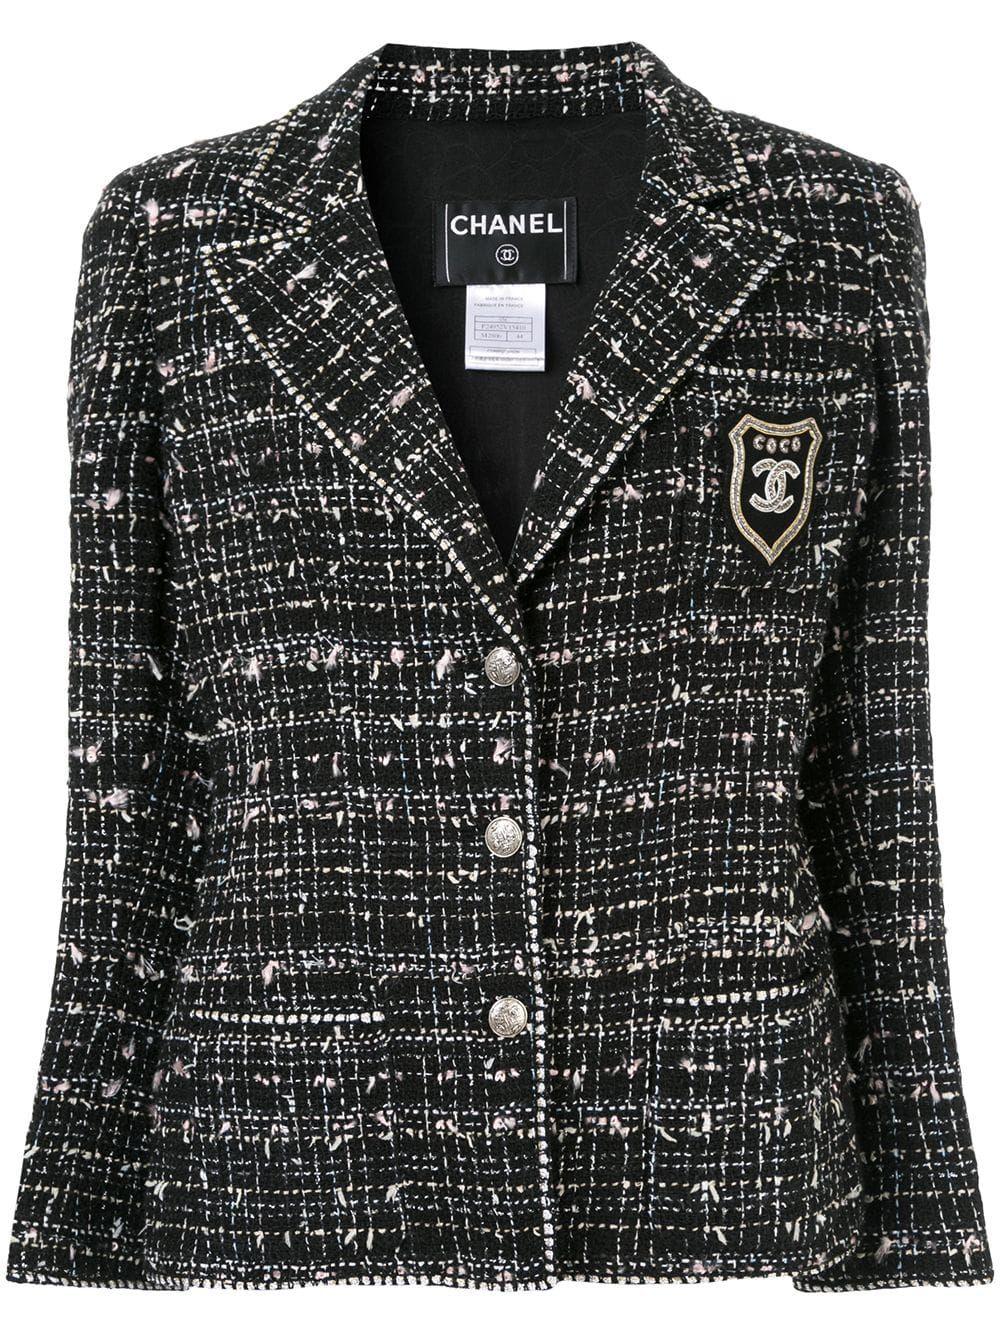 49f51f91455 Chanel Vintage Long Sleeve Jacket in 2019